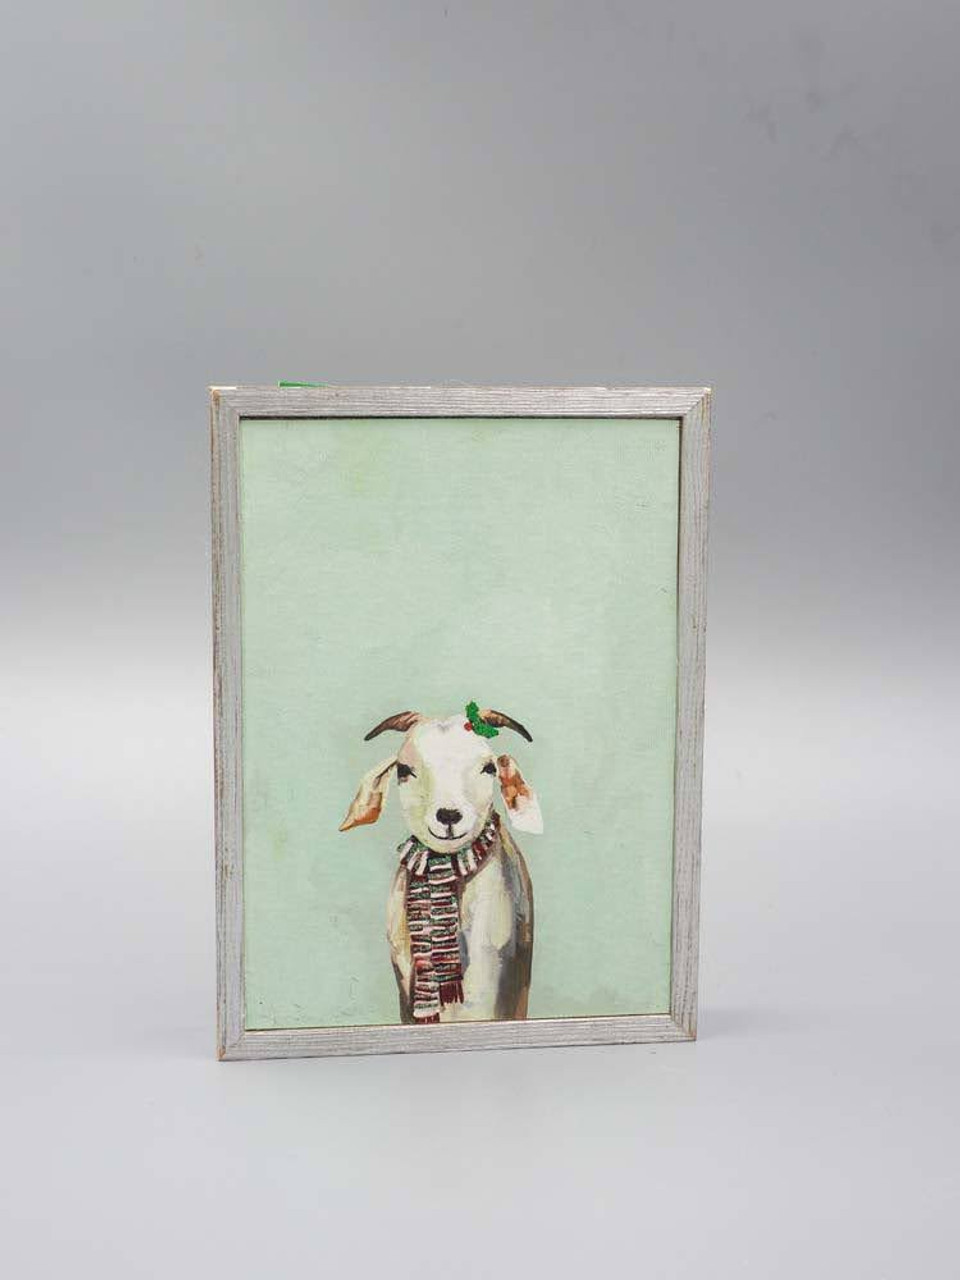 Festive Goat Embellished Mini Framed Canvas